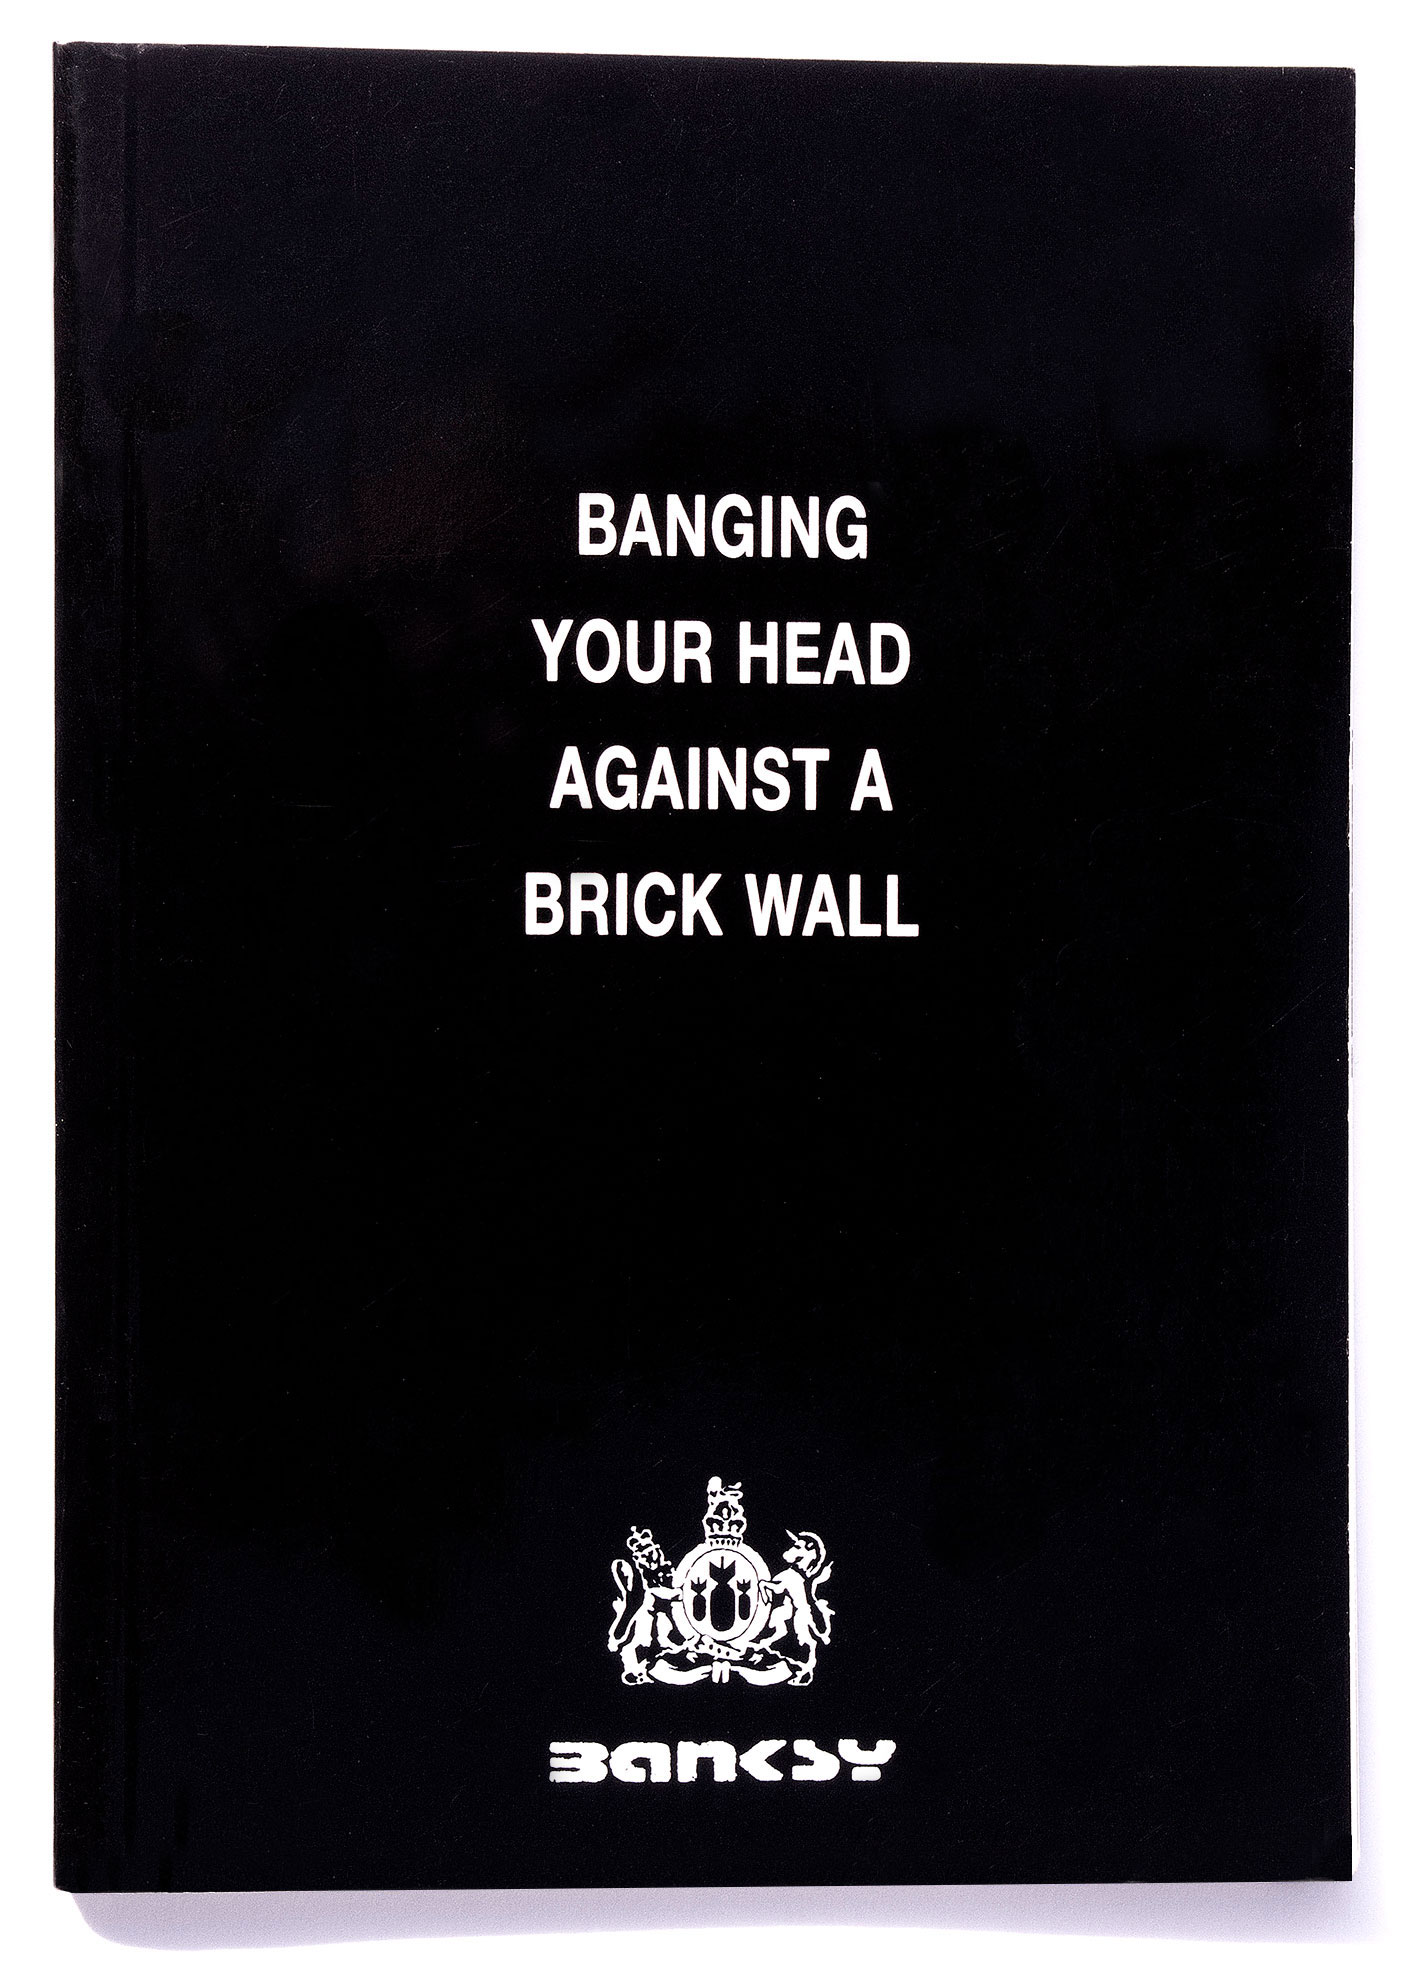 banksy-book--banging-epm-print-management-bristol-1.jpg